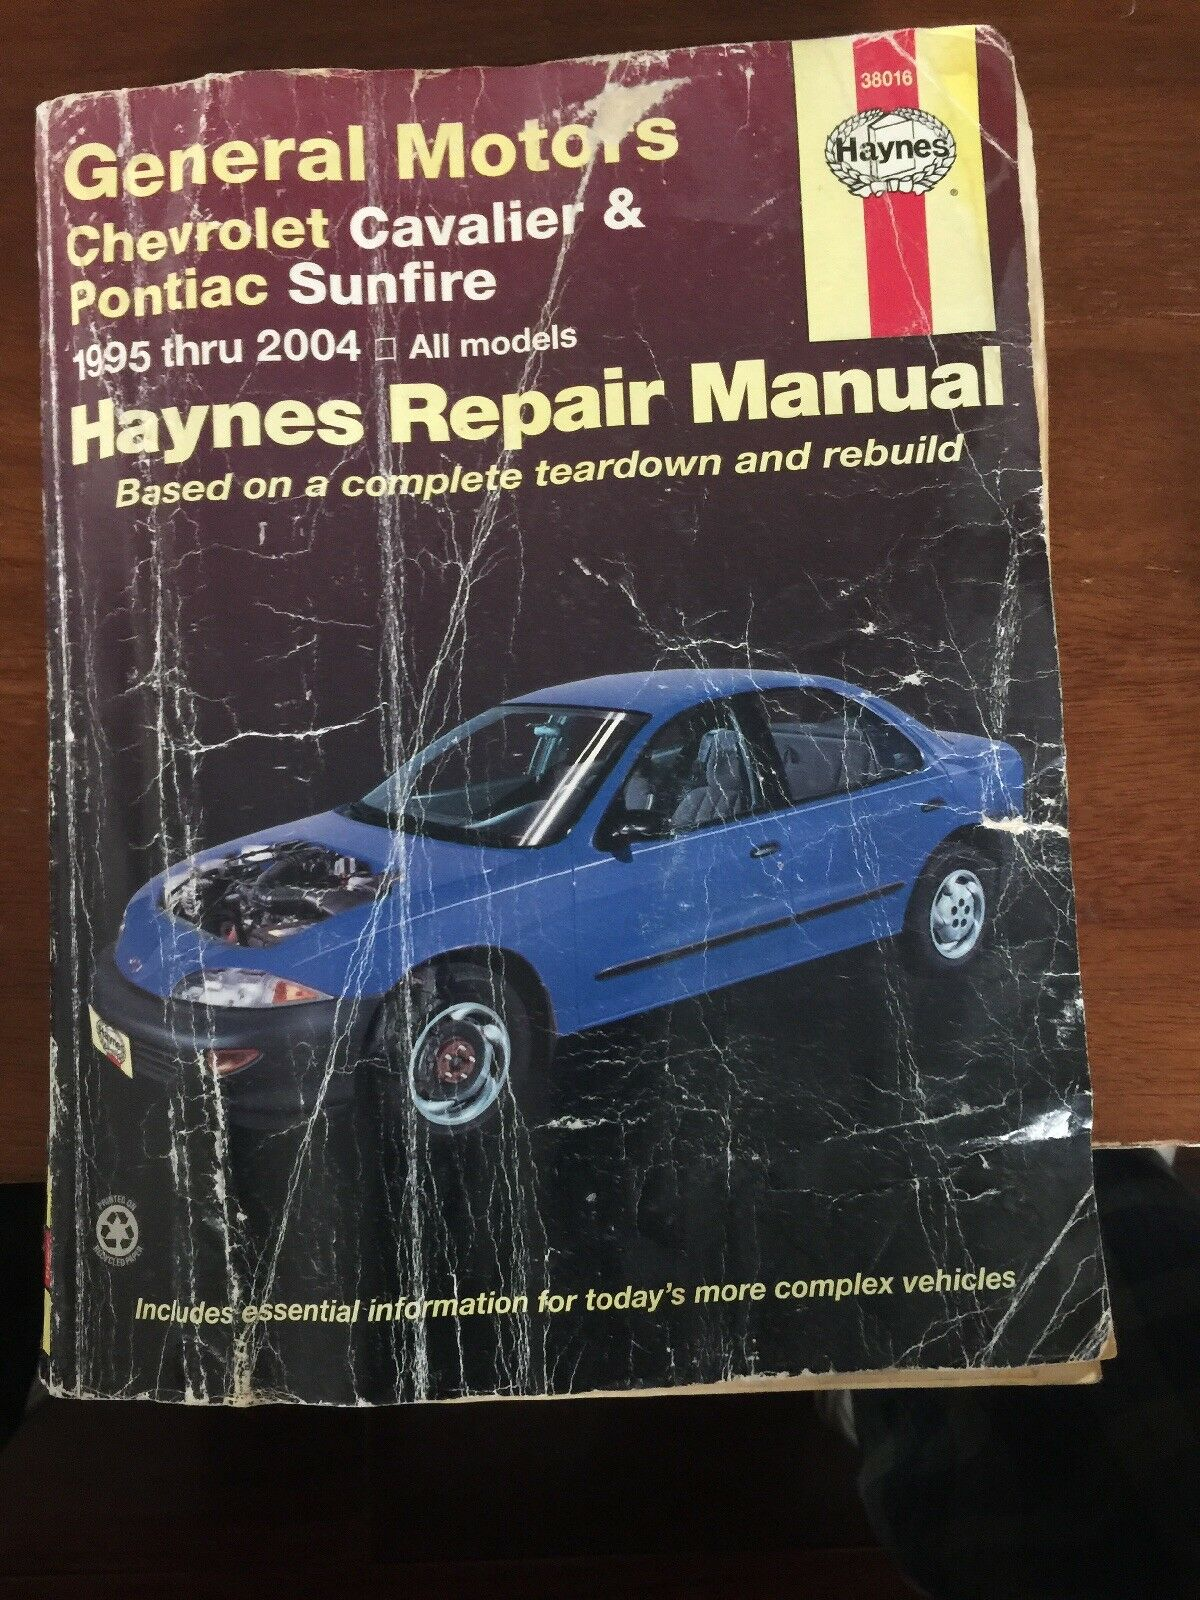 Haynes Repair Manual: General Motors Chevrolet Cavalier and Pontiac Sunfire  : 1995 thru 2004 by John H. Haynes (2005, Paperback, New Edition) | eBay